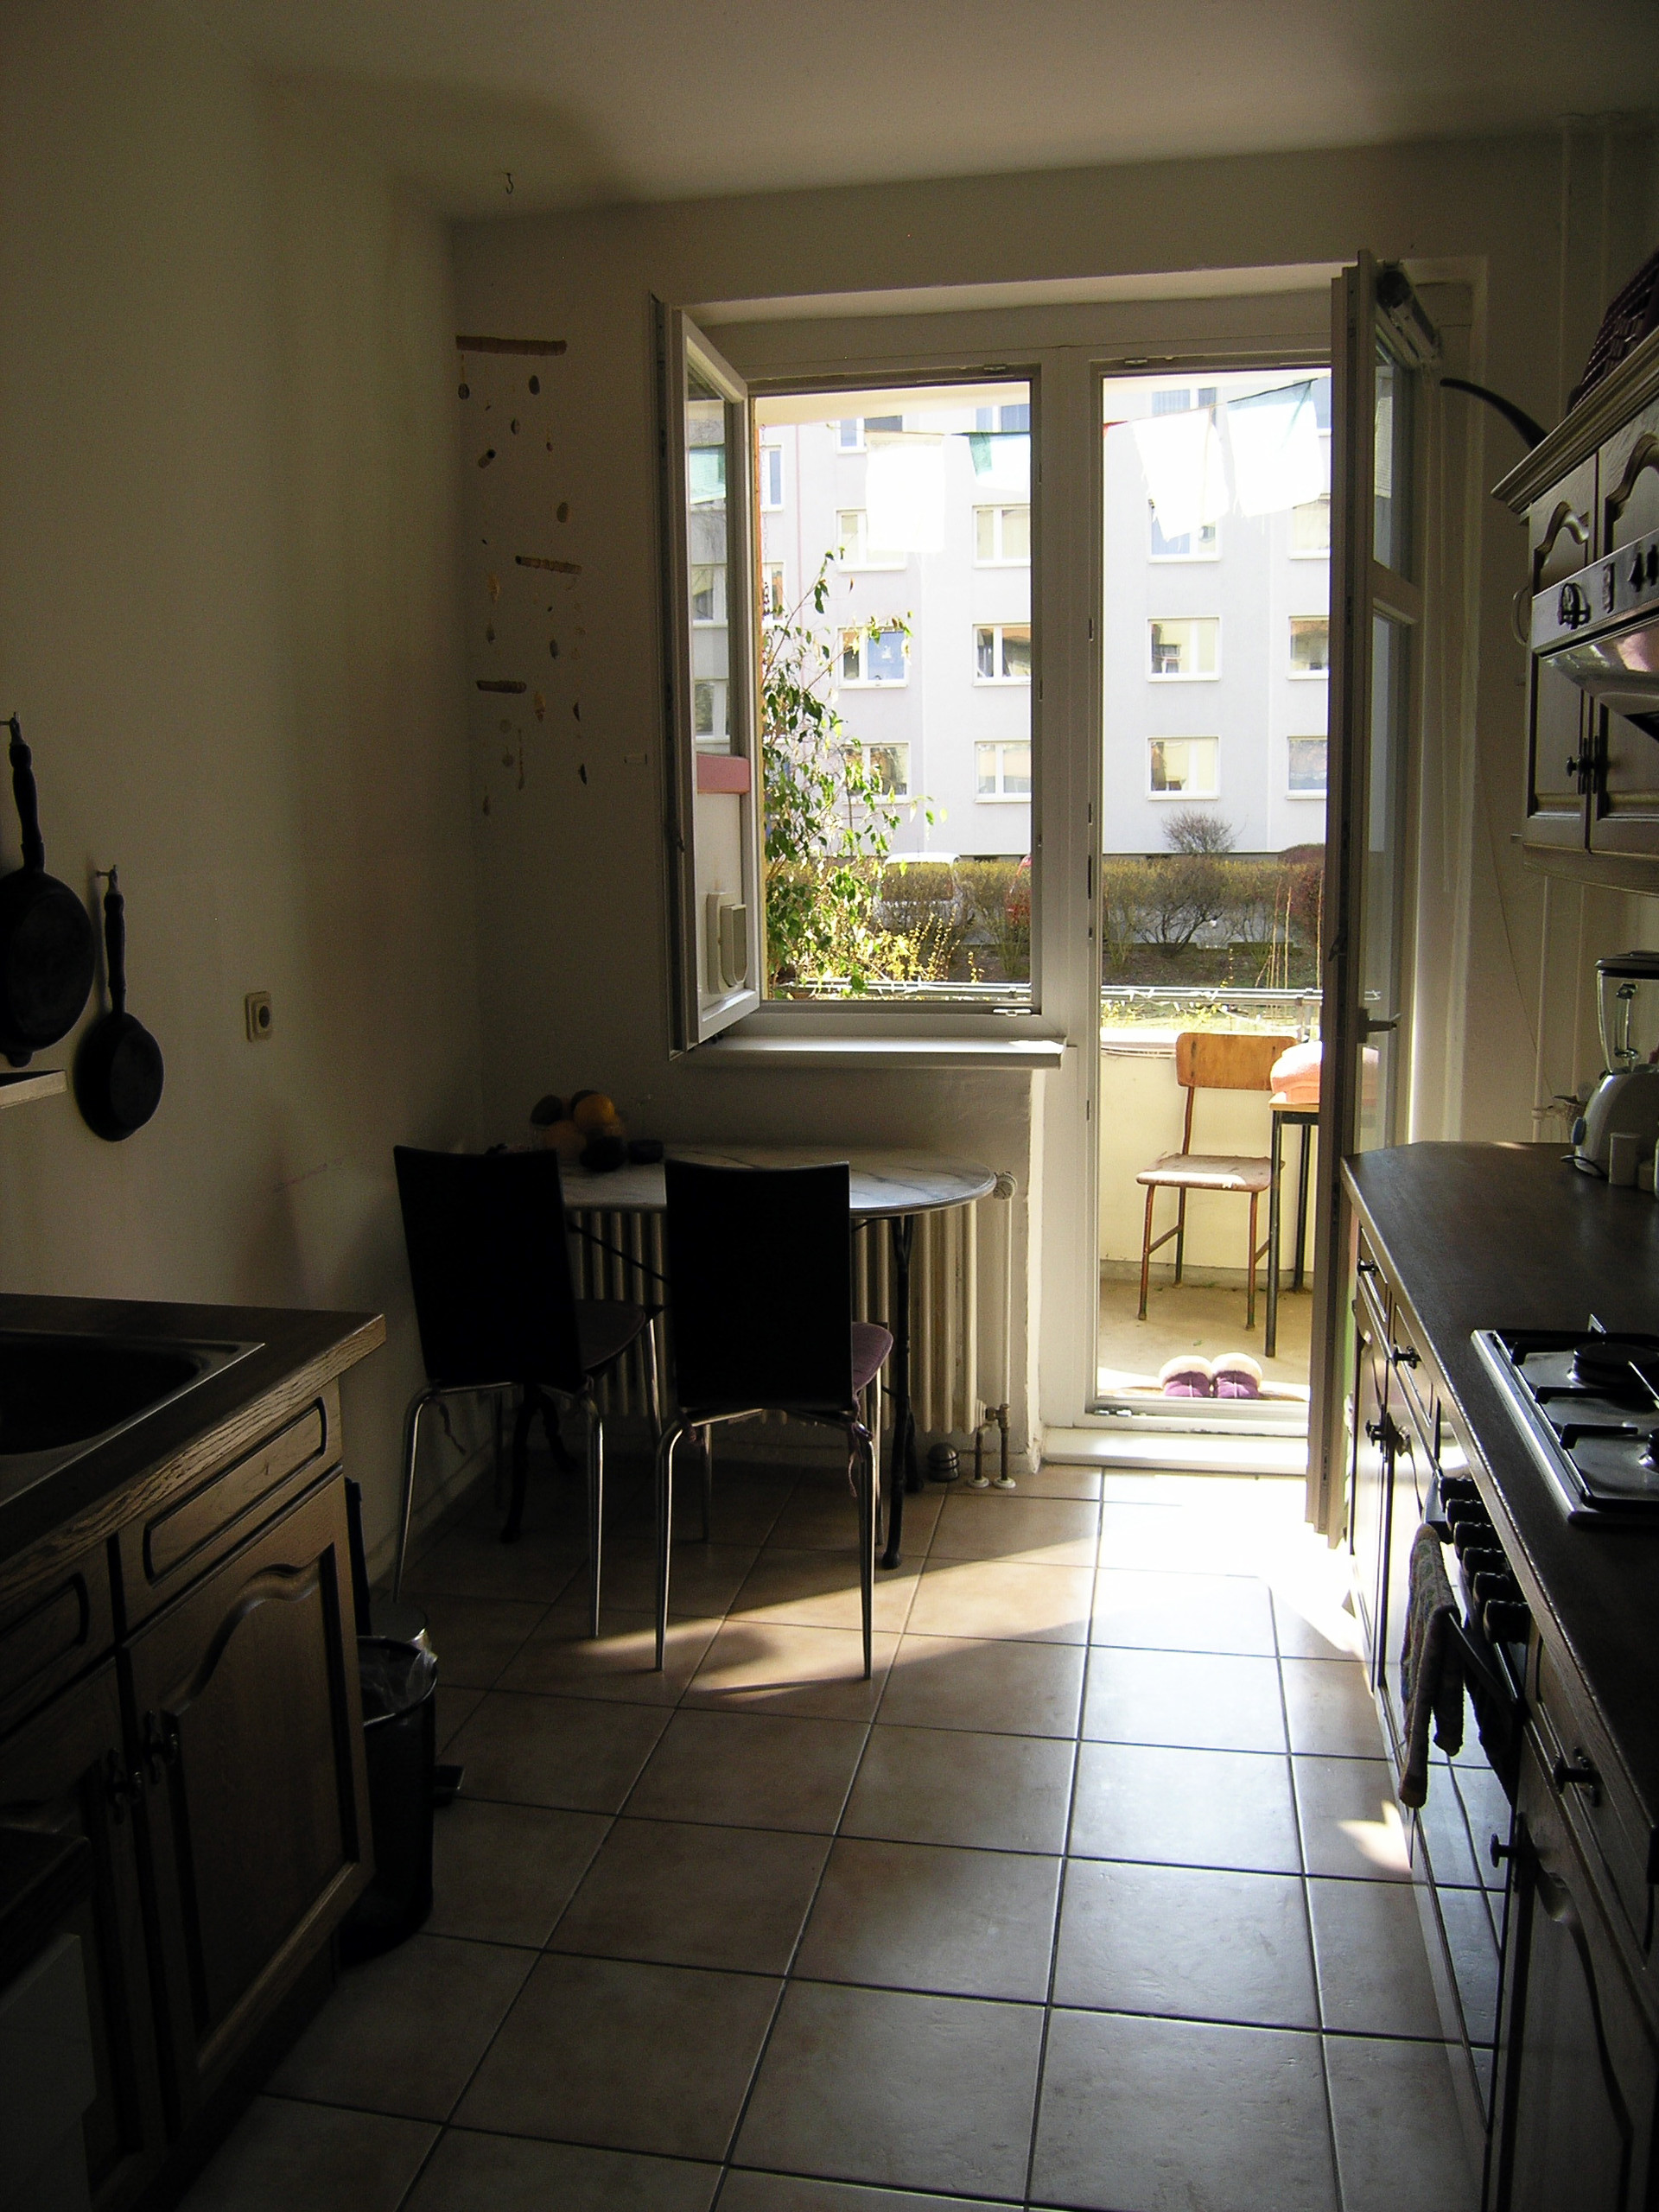 Rent Room For Student In Berlin